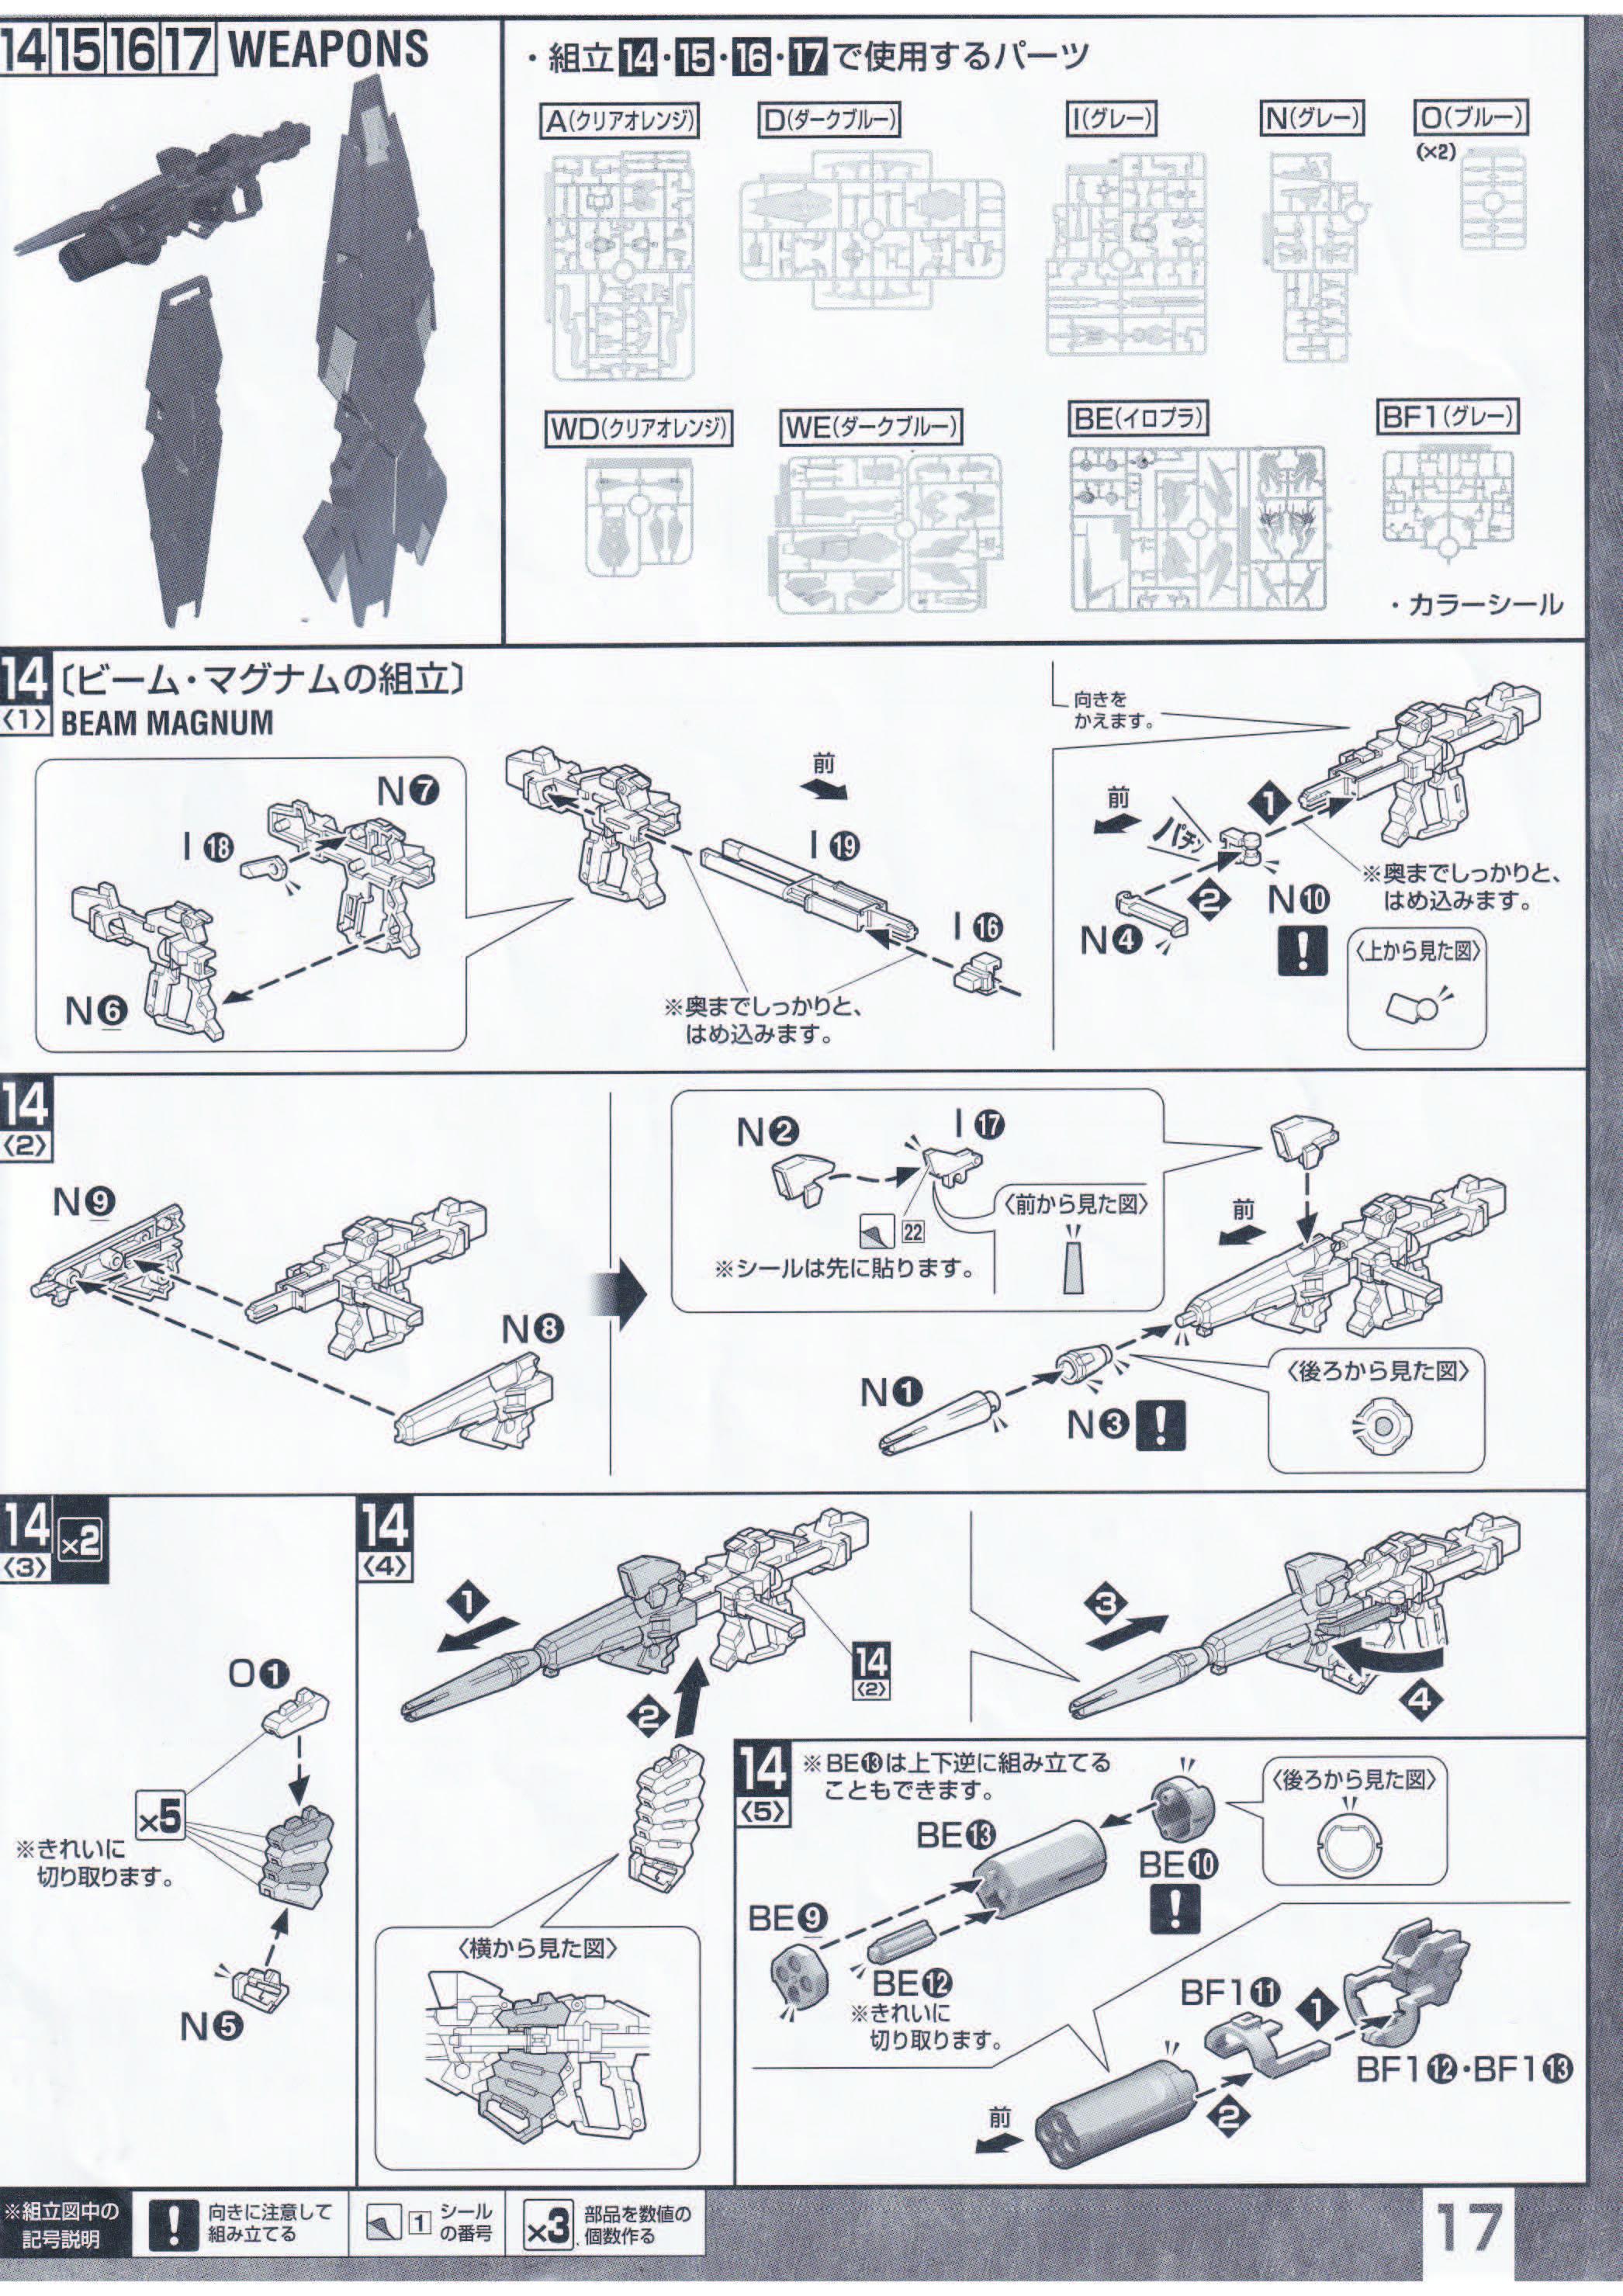 G383_info_weapons_ページ_07